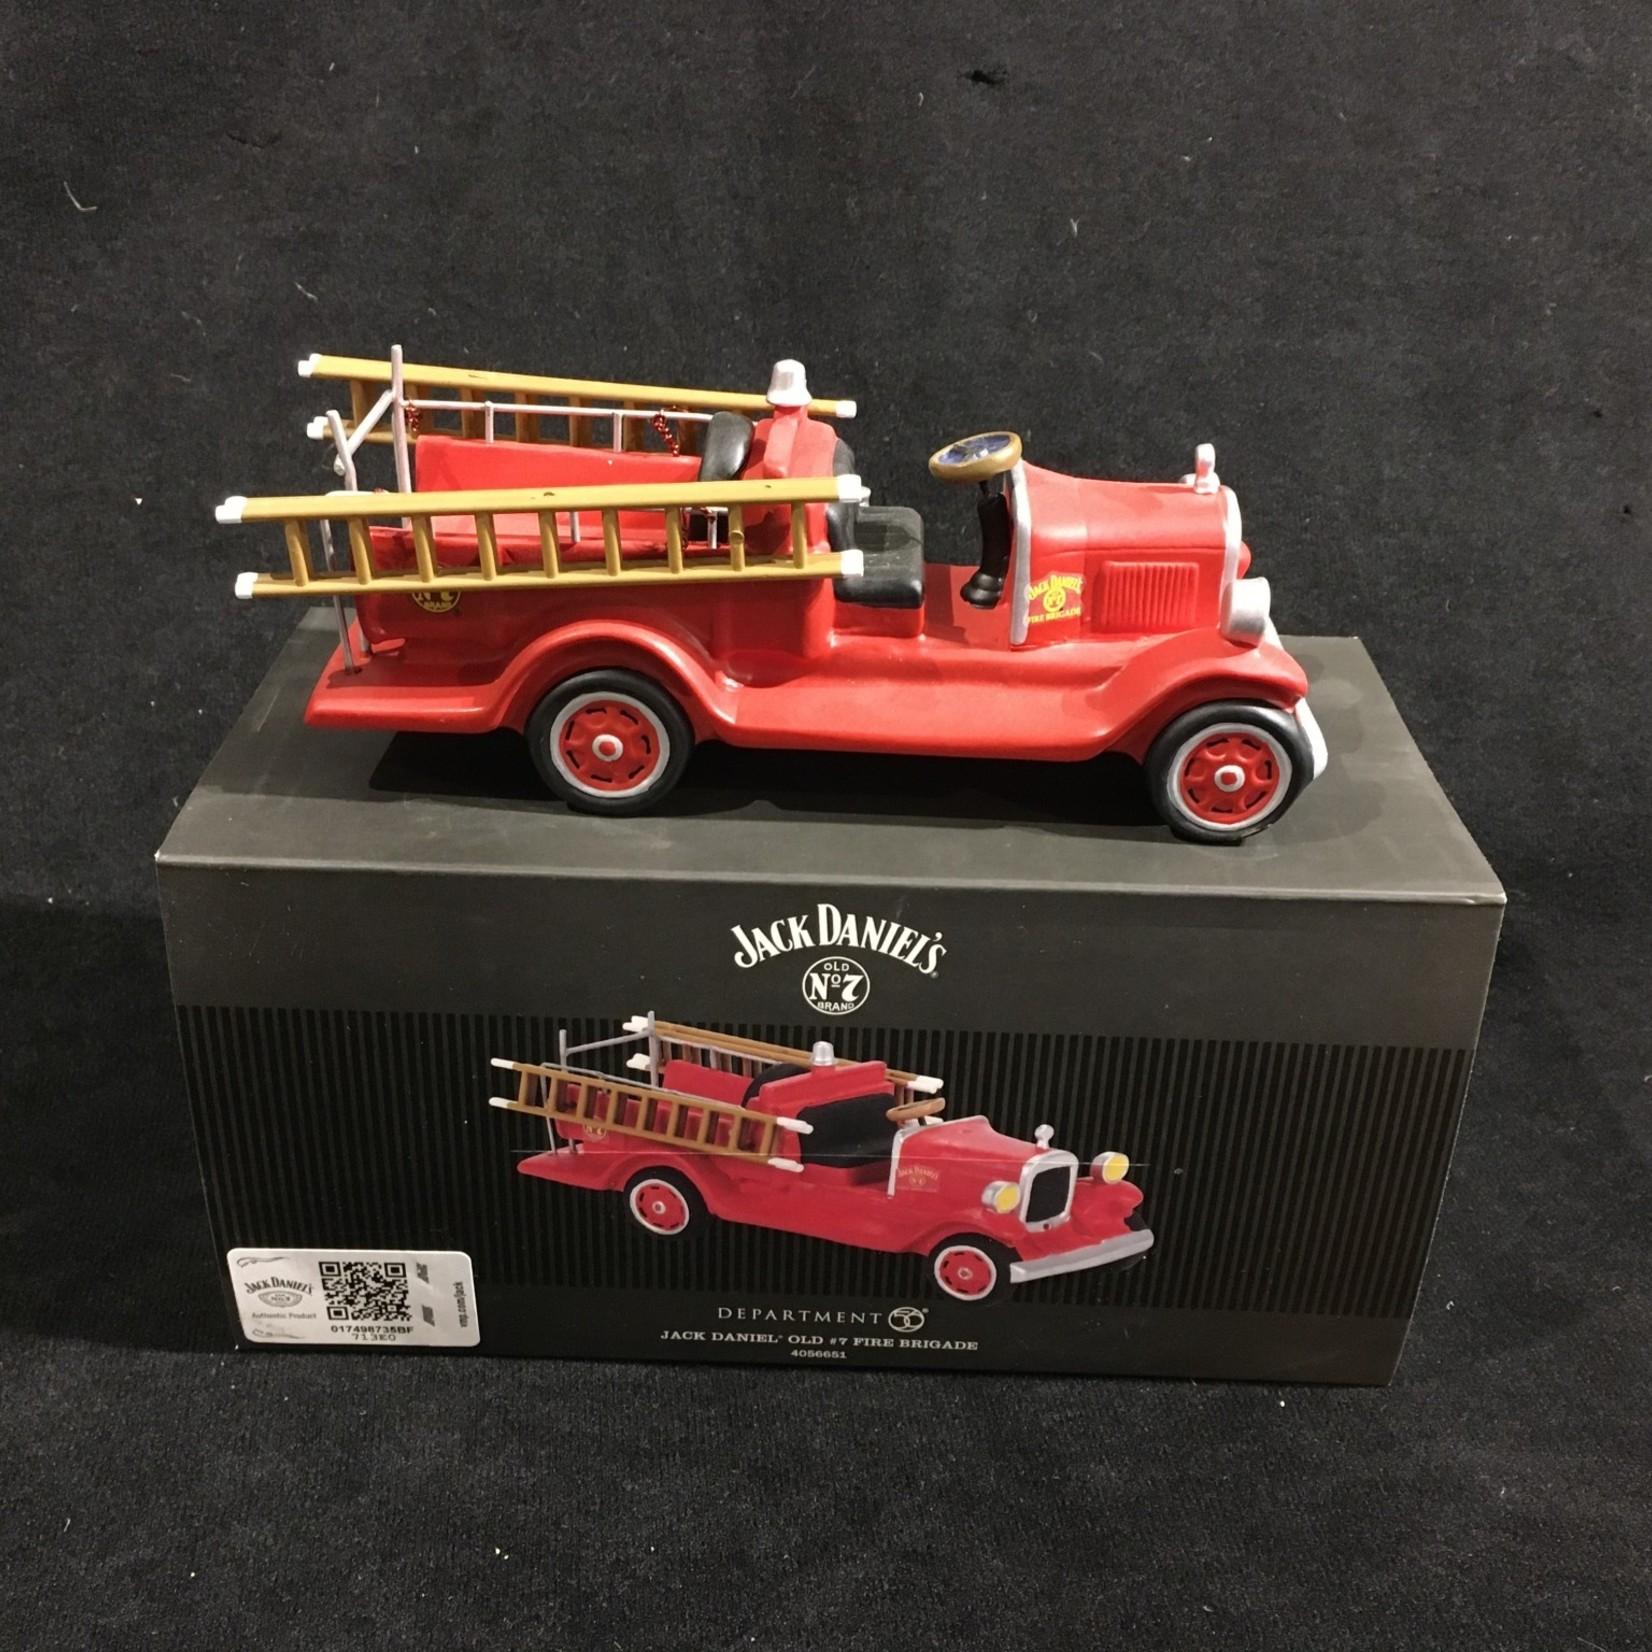 "6x2"" Jack Daniel's Fire Truck"